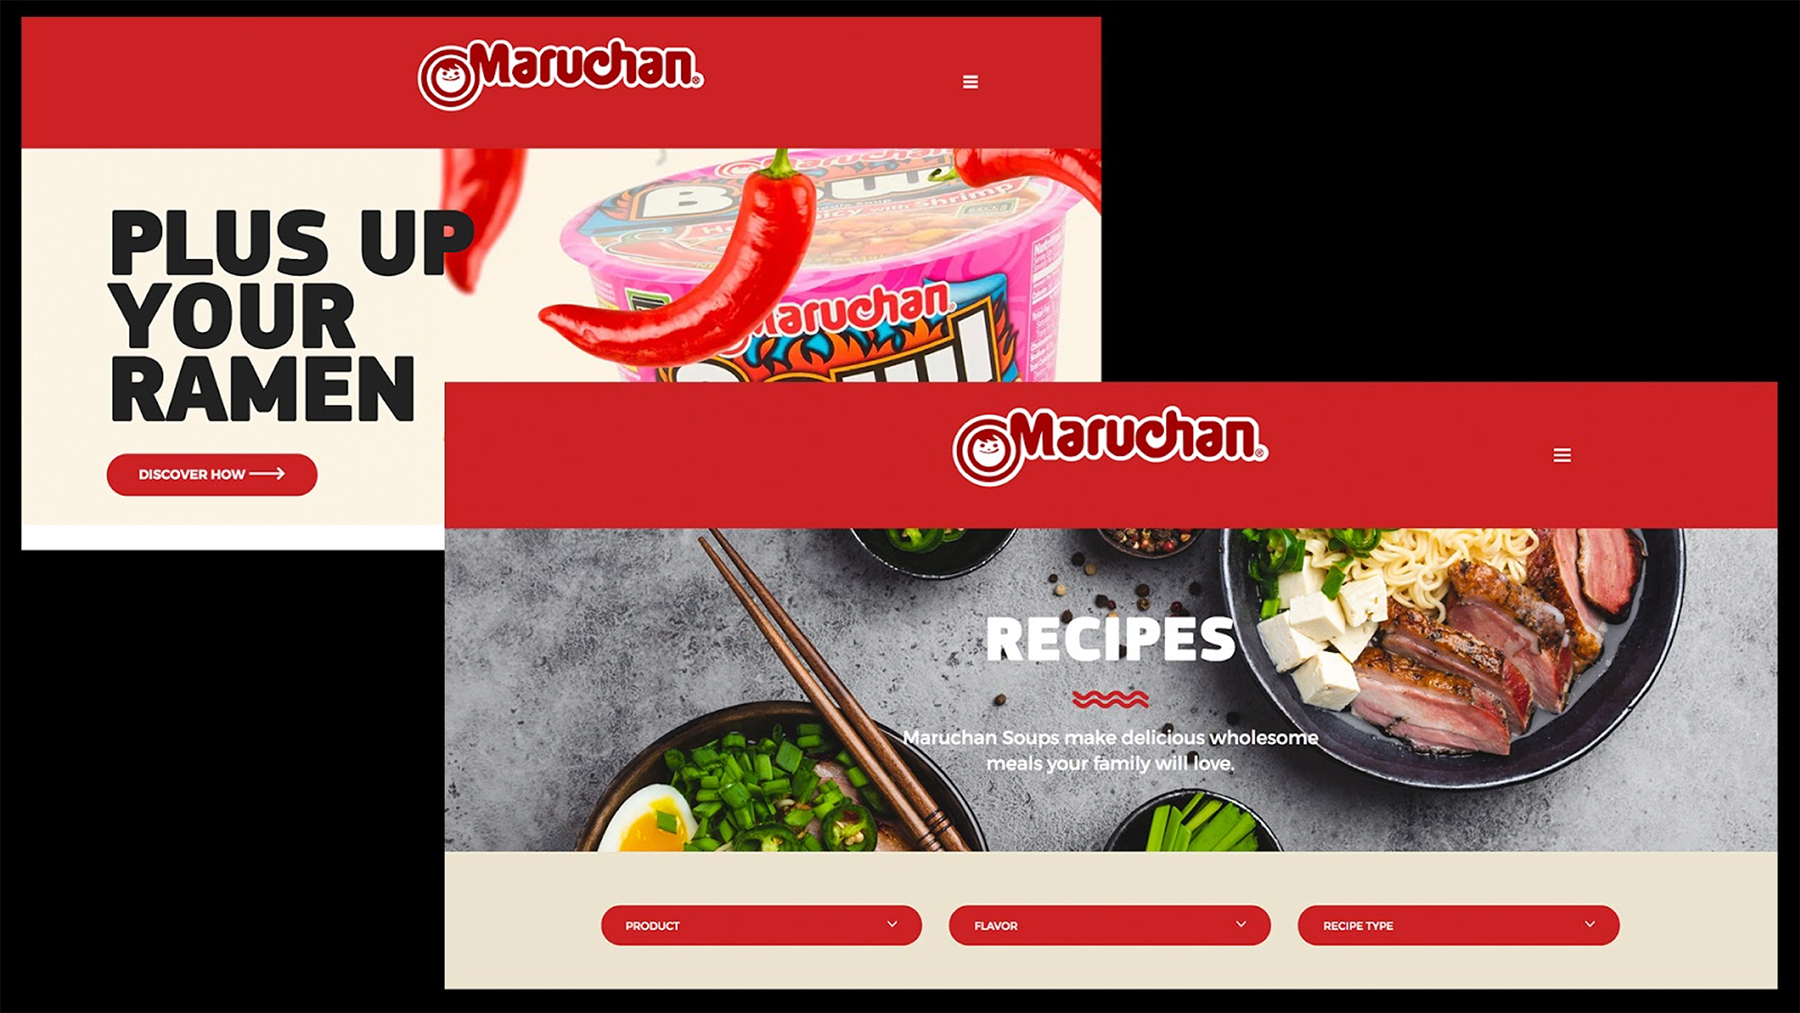 LaunchedaNewMaruchan-1